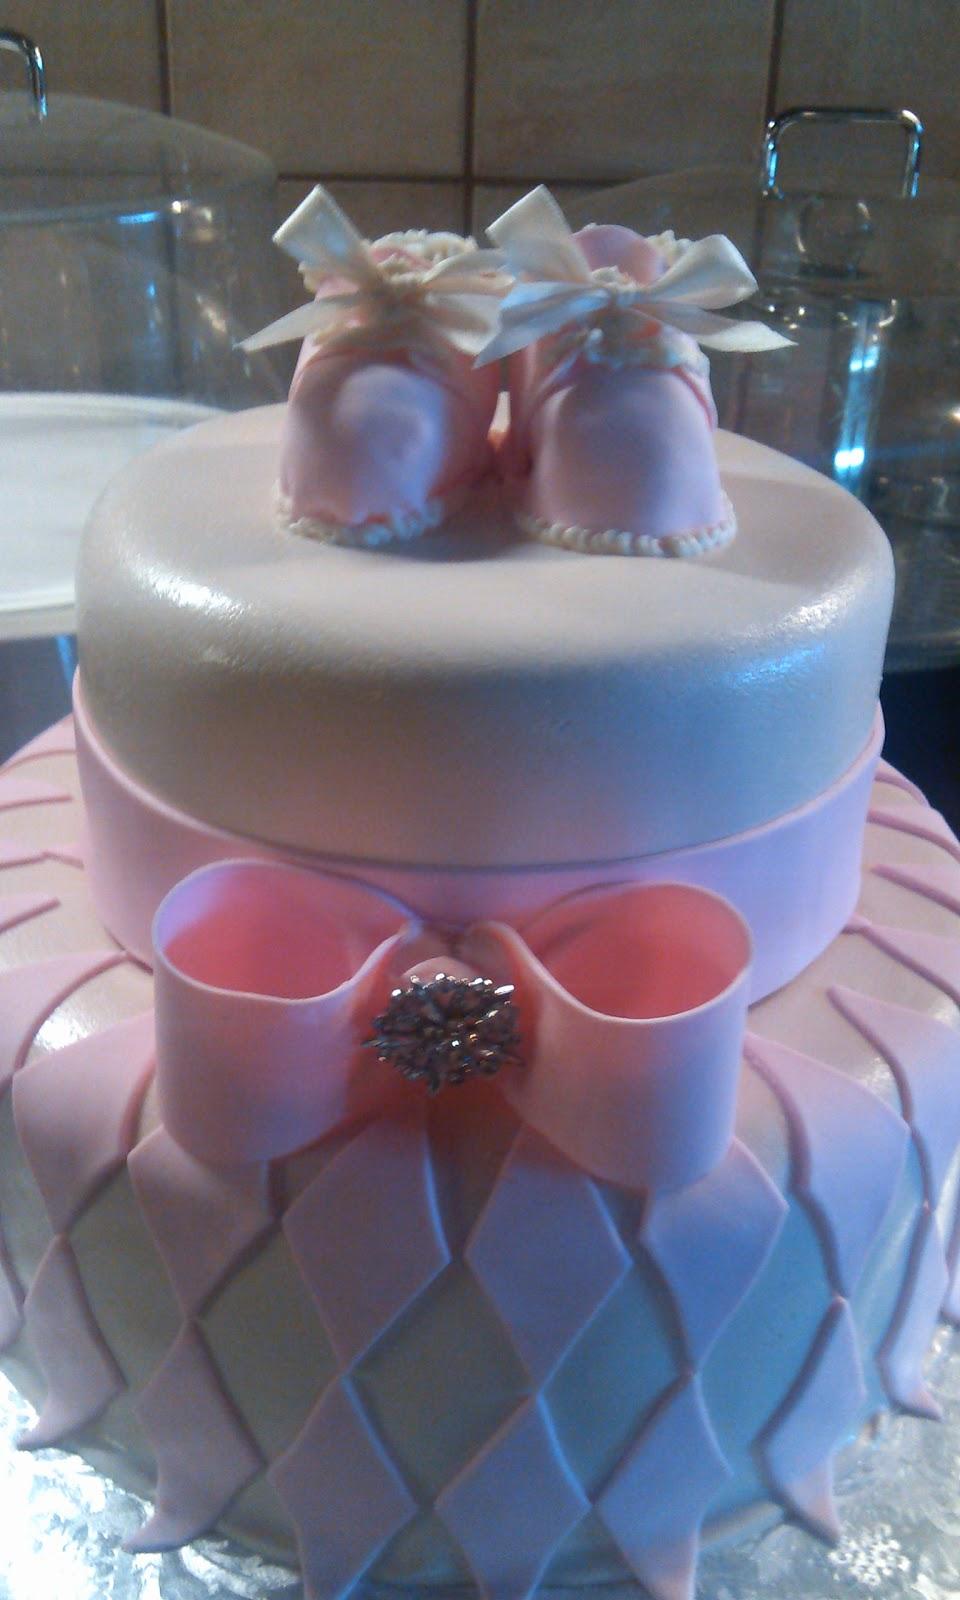 Cake Art Lawrenceville Hwy : CAFE AROMAS: Baby Bootie Fondant Cake